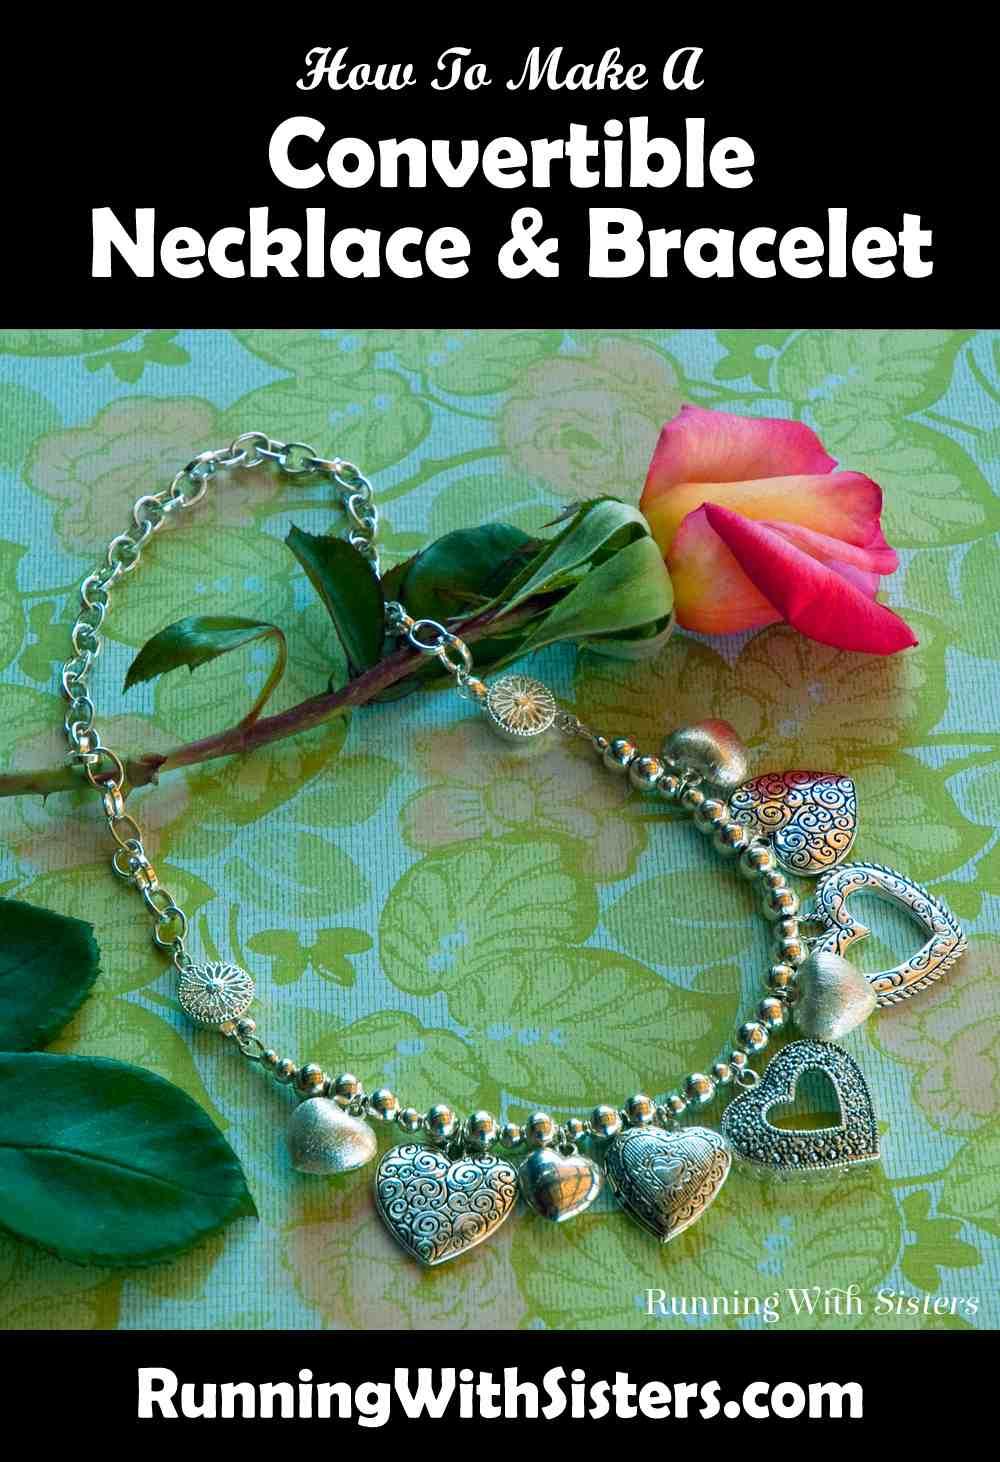 Change Of Heart Convertible Necklace Bracelet